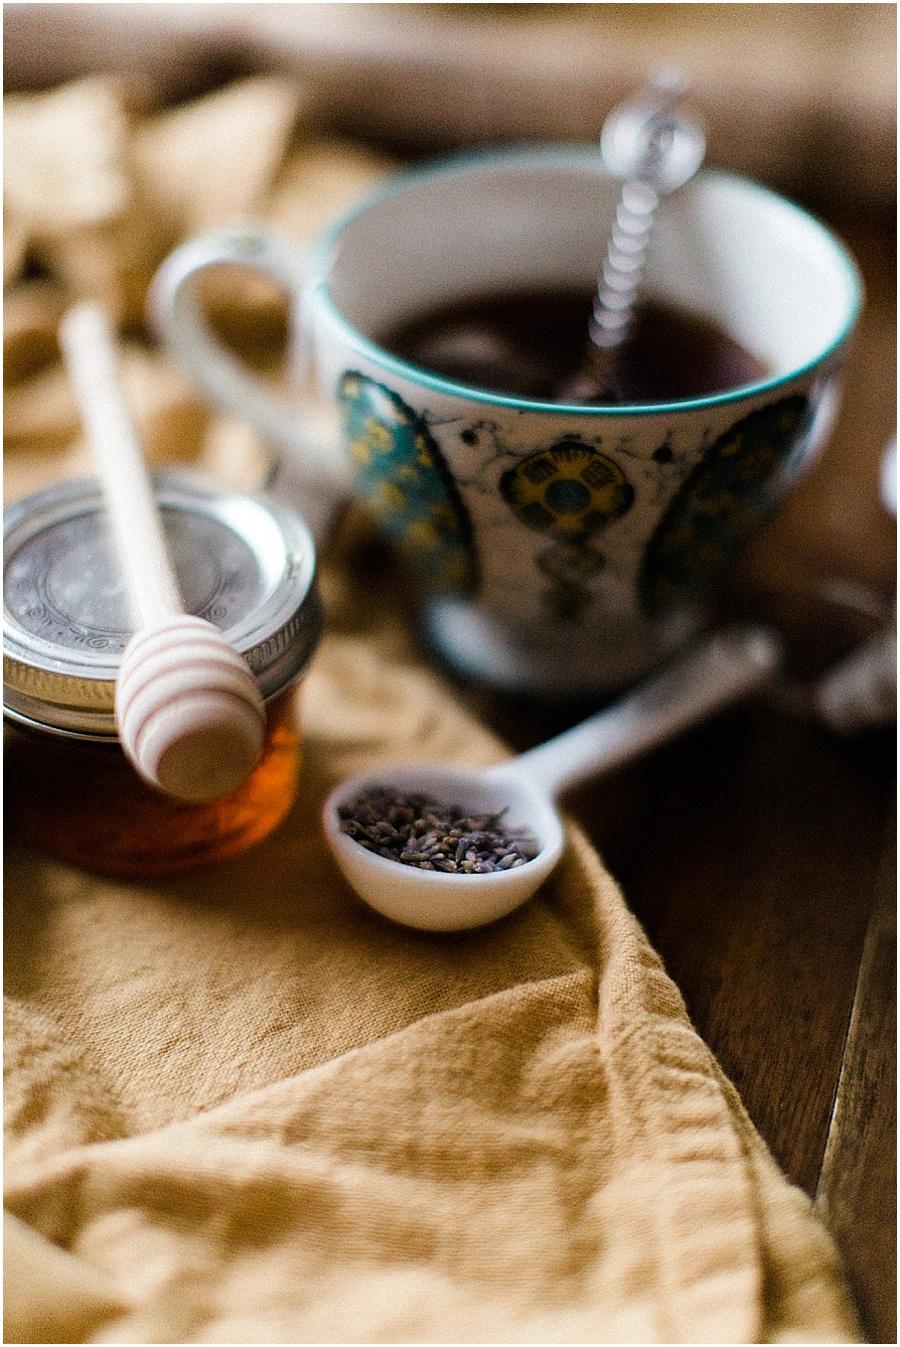 quaint-and-whim-baking-honey-lavender-4972.jpg